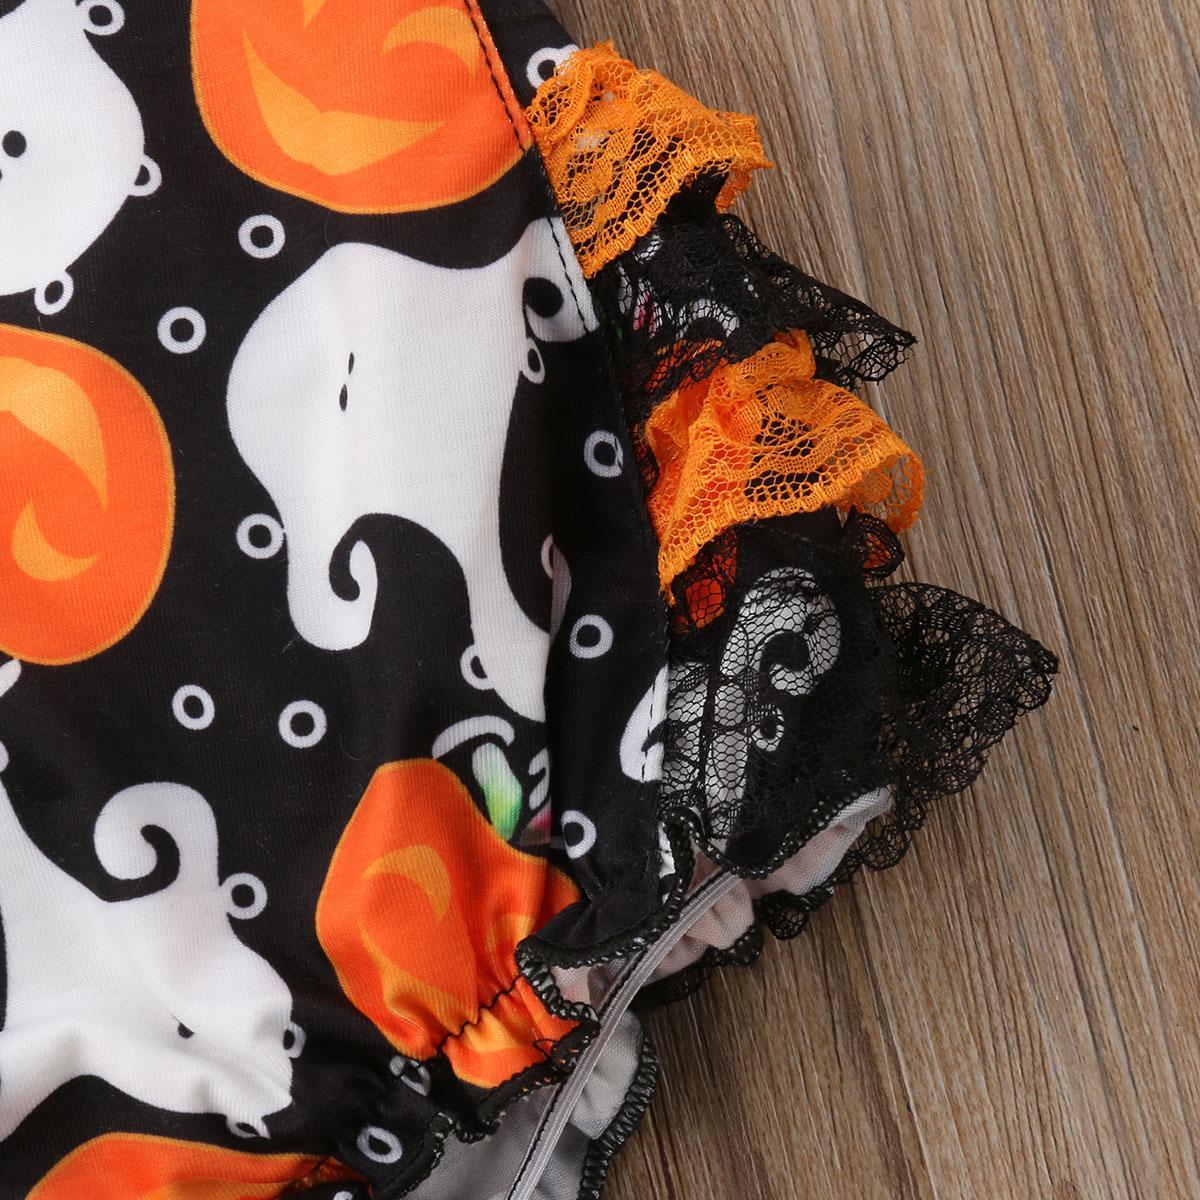 Halloween adorável Bebé recém-nascido infantil Verão sem mangas Jumpsuit Bodysuit roupa vestido Tutu Outfit